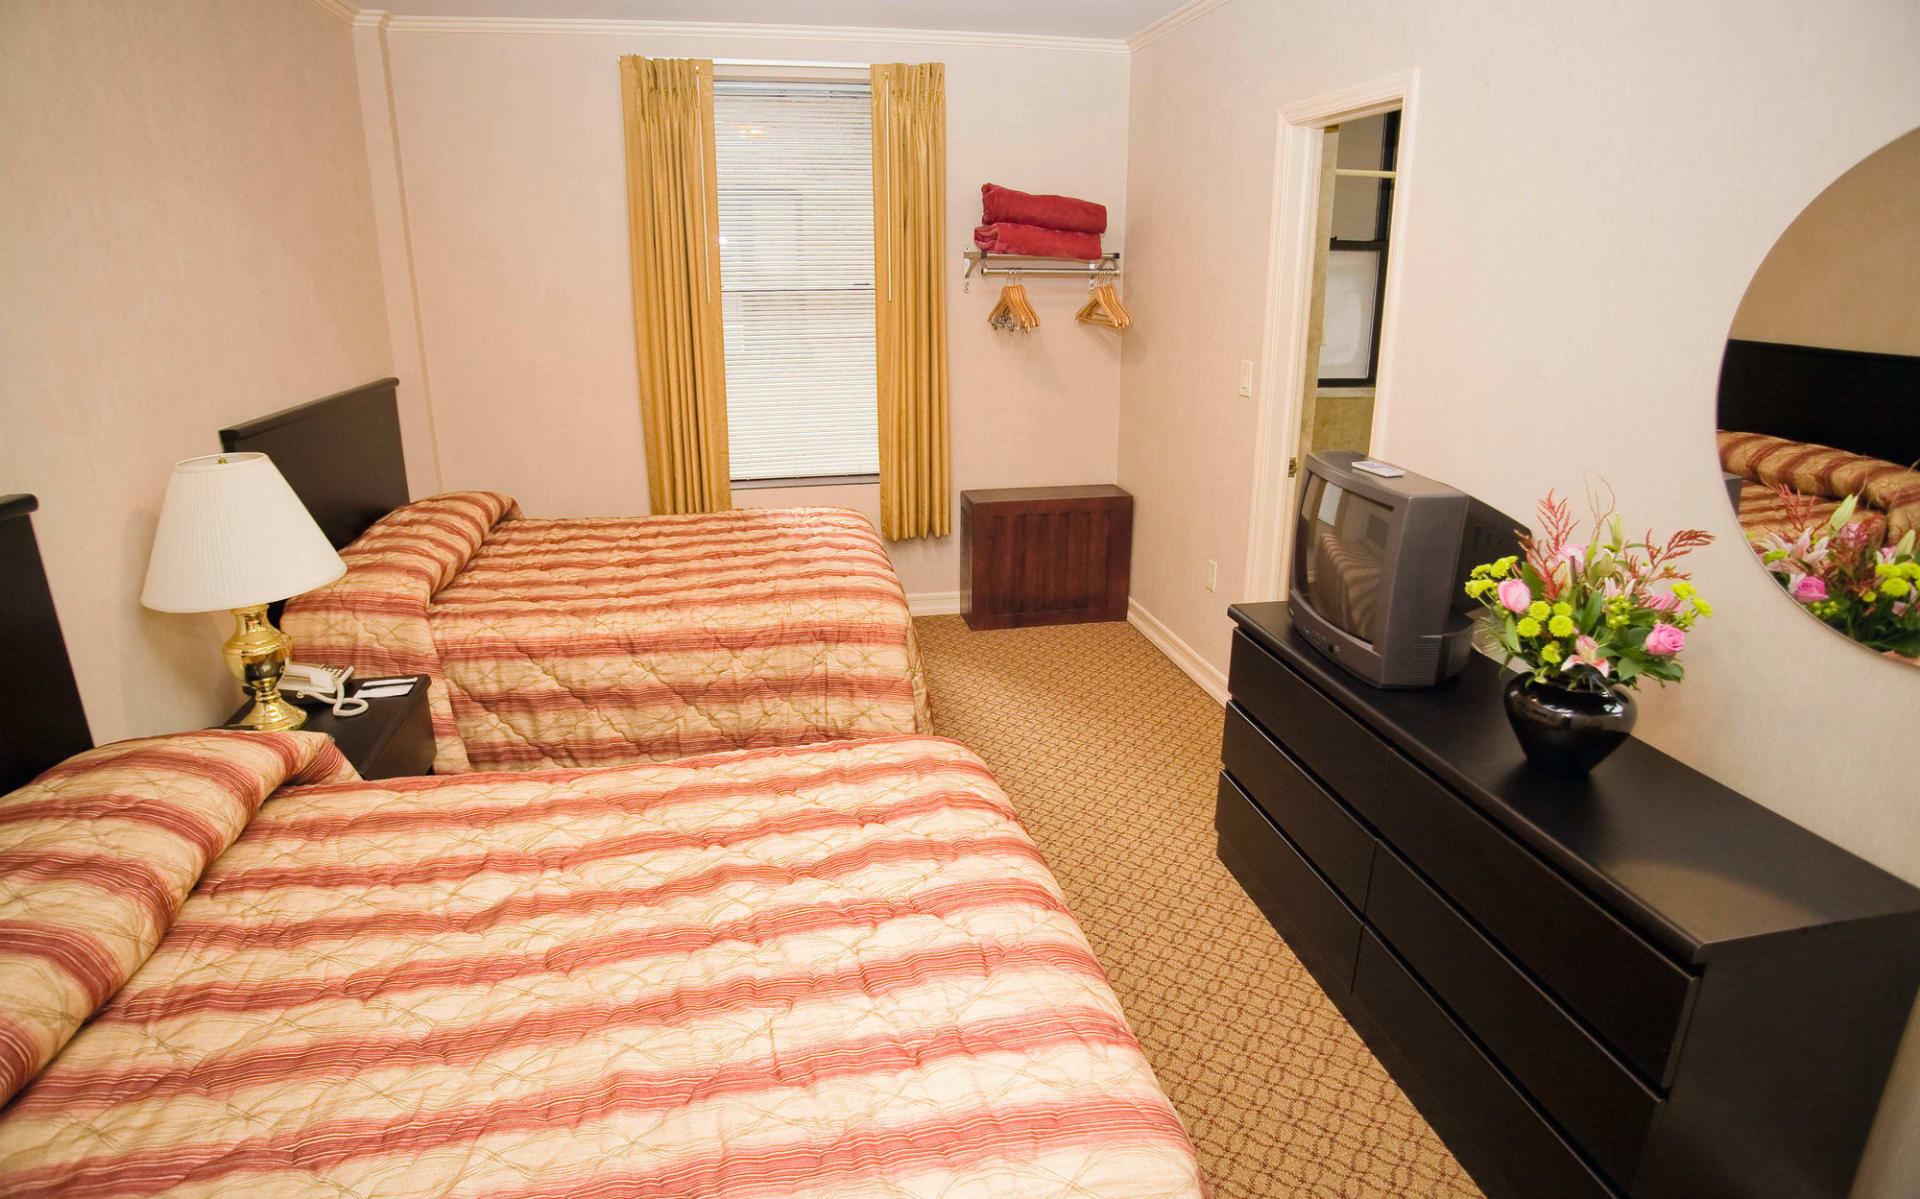 Radio City Apartments in New York - Manhattan:  Radio City Apartment - Bedroom